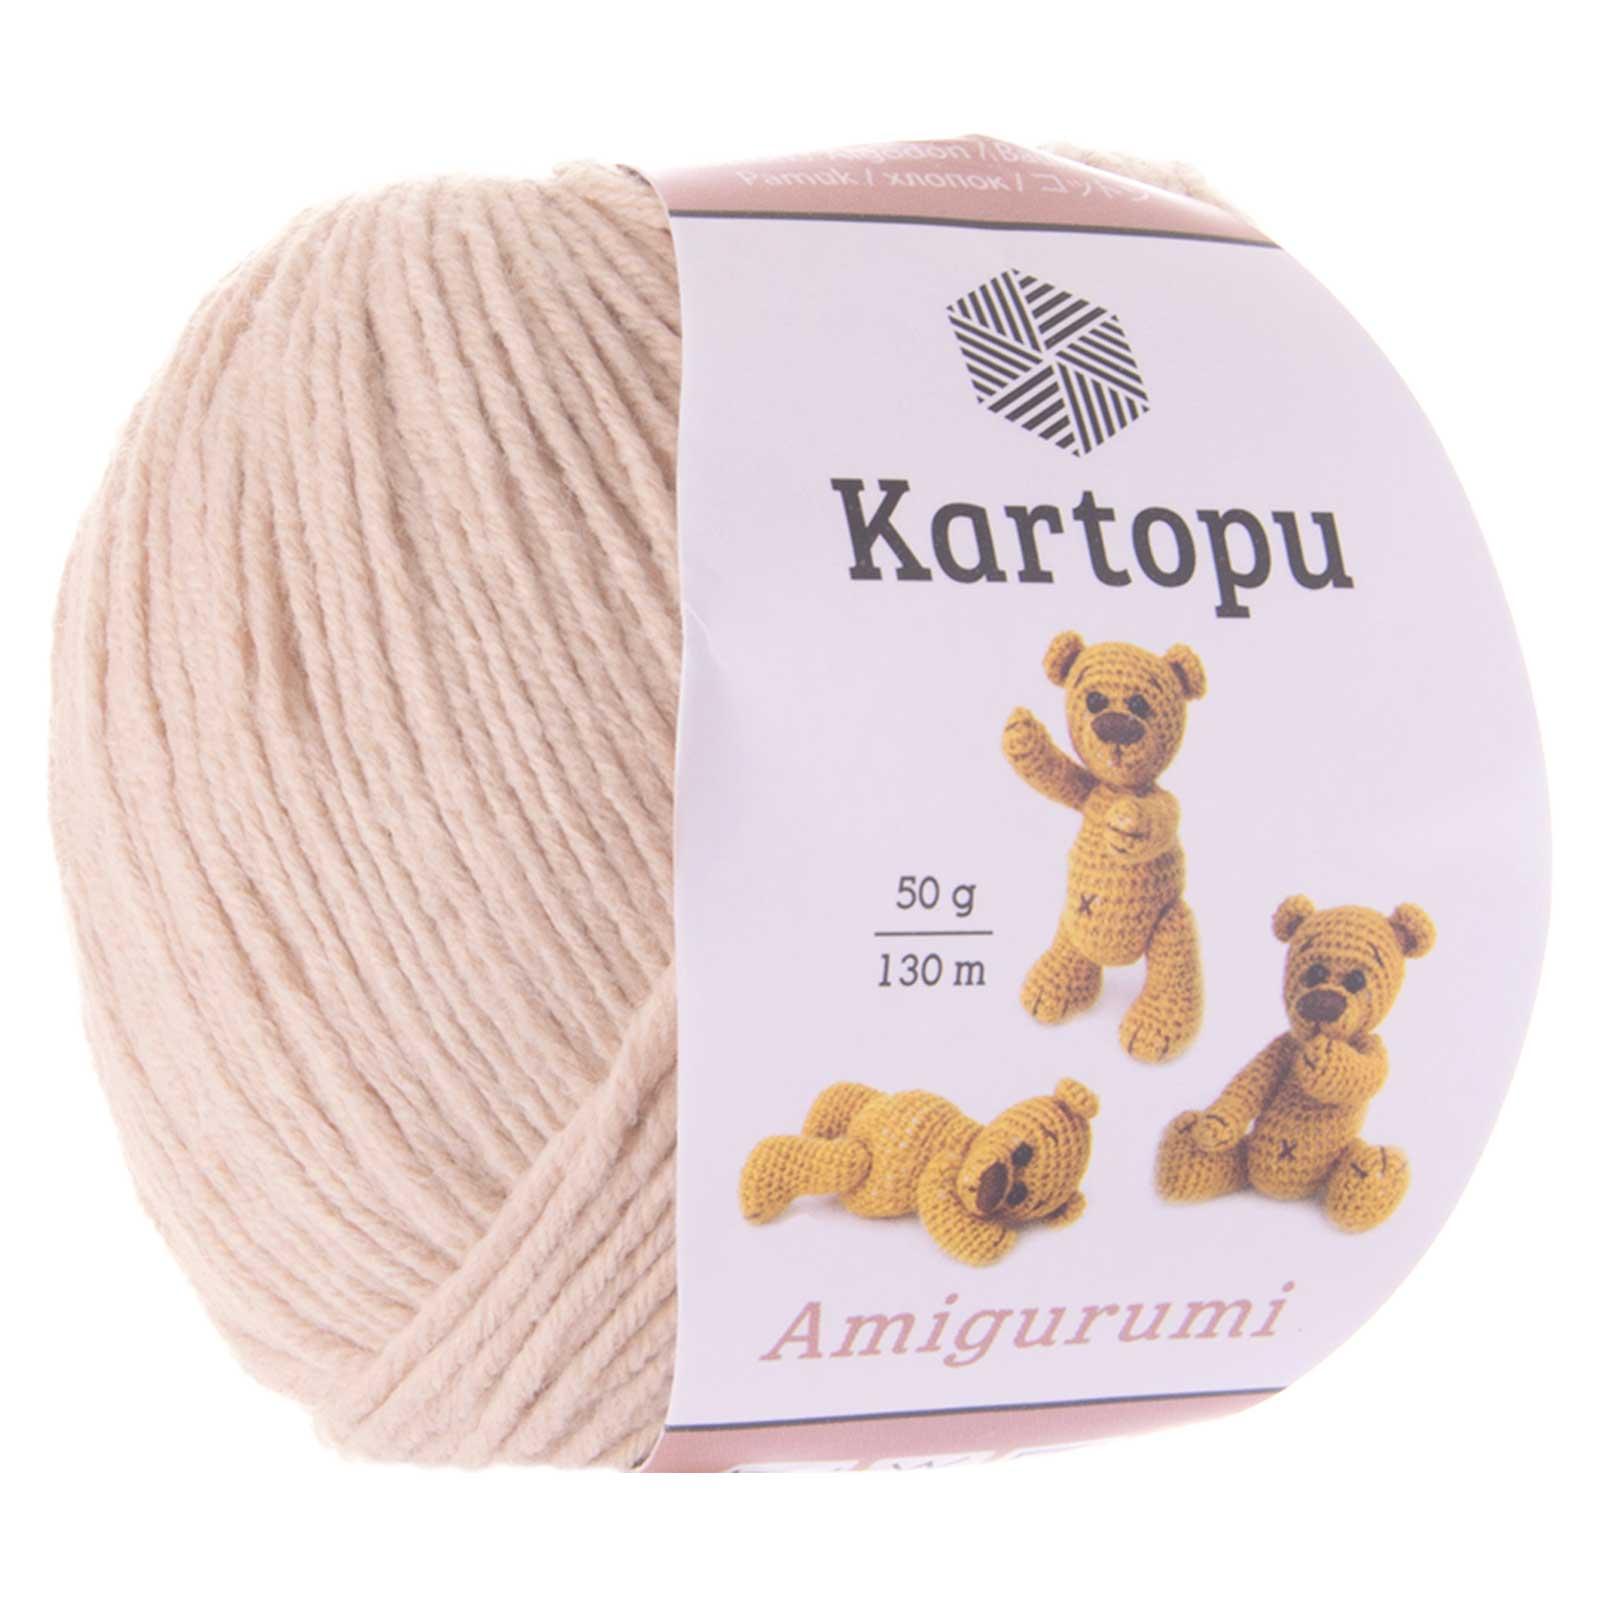 Kartopu Amigurumi DK – My Yarnery | 1600x1600